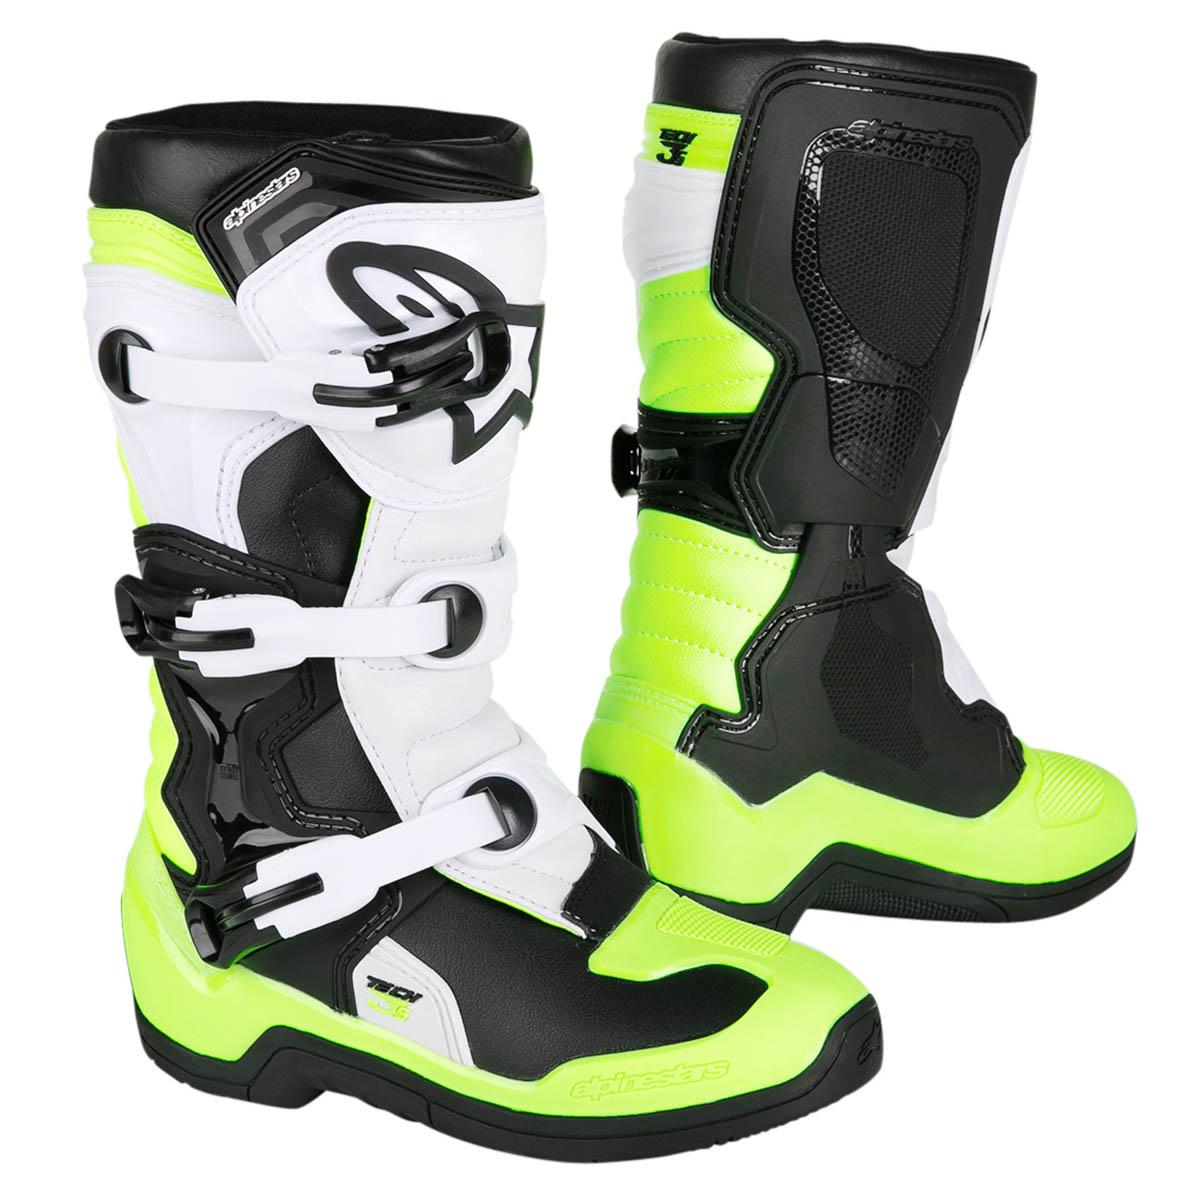 3872b7373a56e8 Alpinestars Kids MX Boots Tech 3S Youth Black White Yellow Fluo 2019 ...